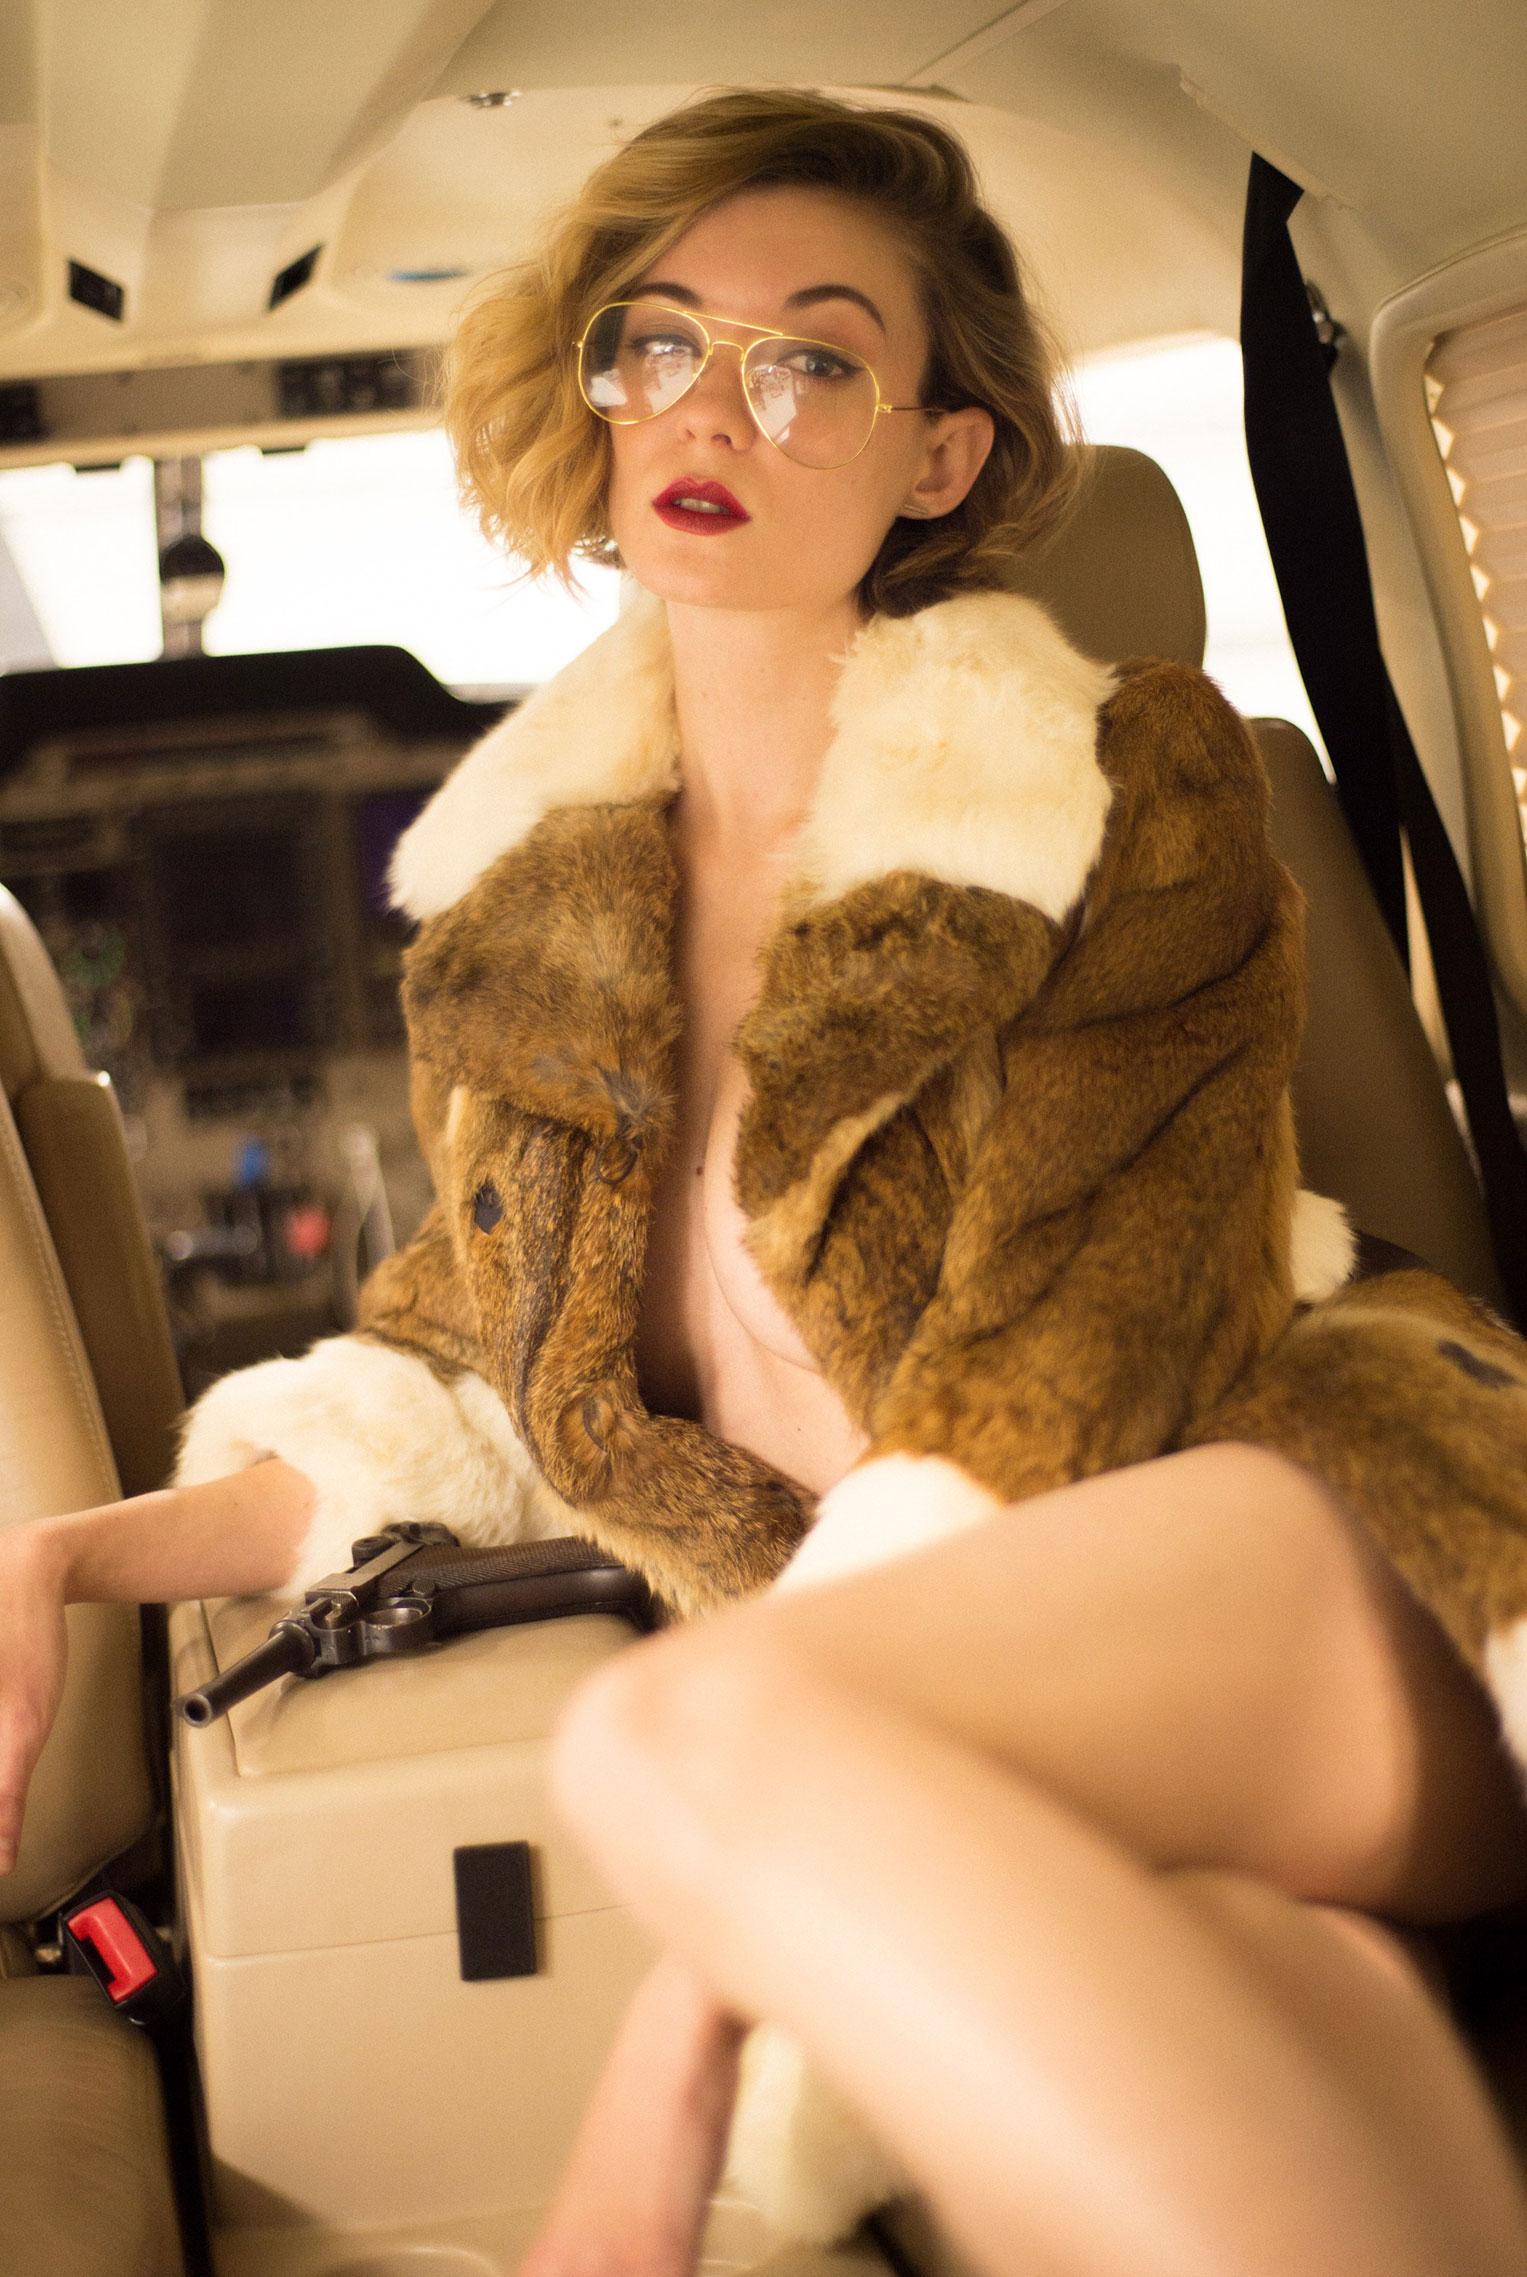 сексуальная угонщица самолета Анна-Лиза / фото 02